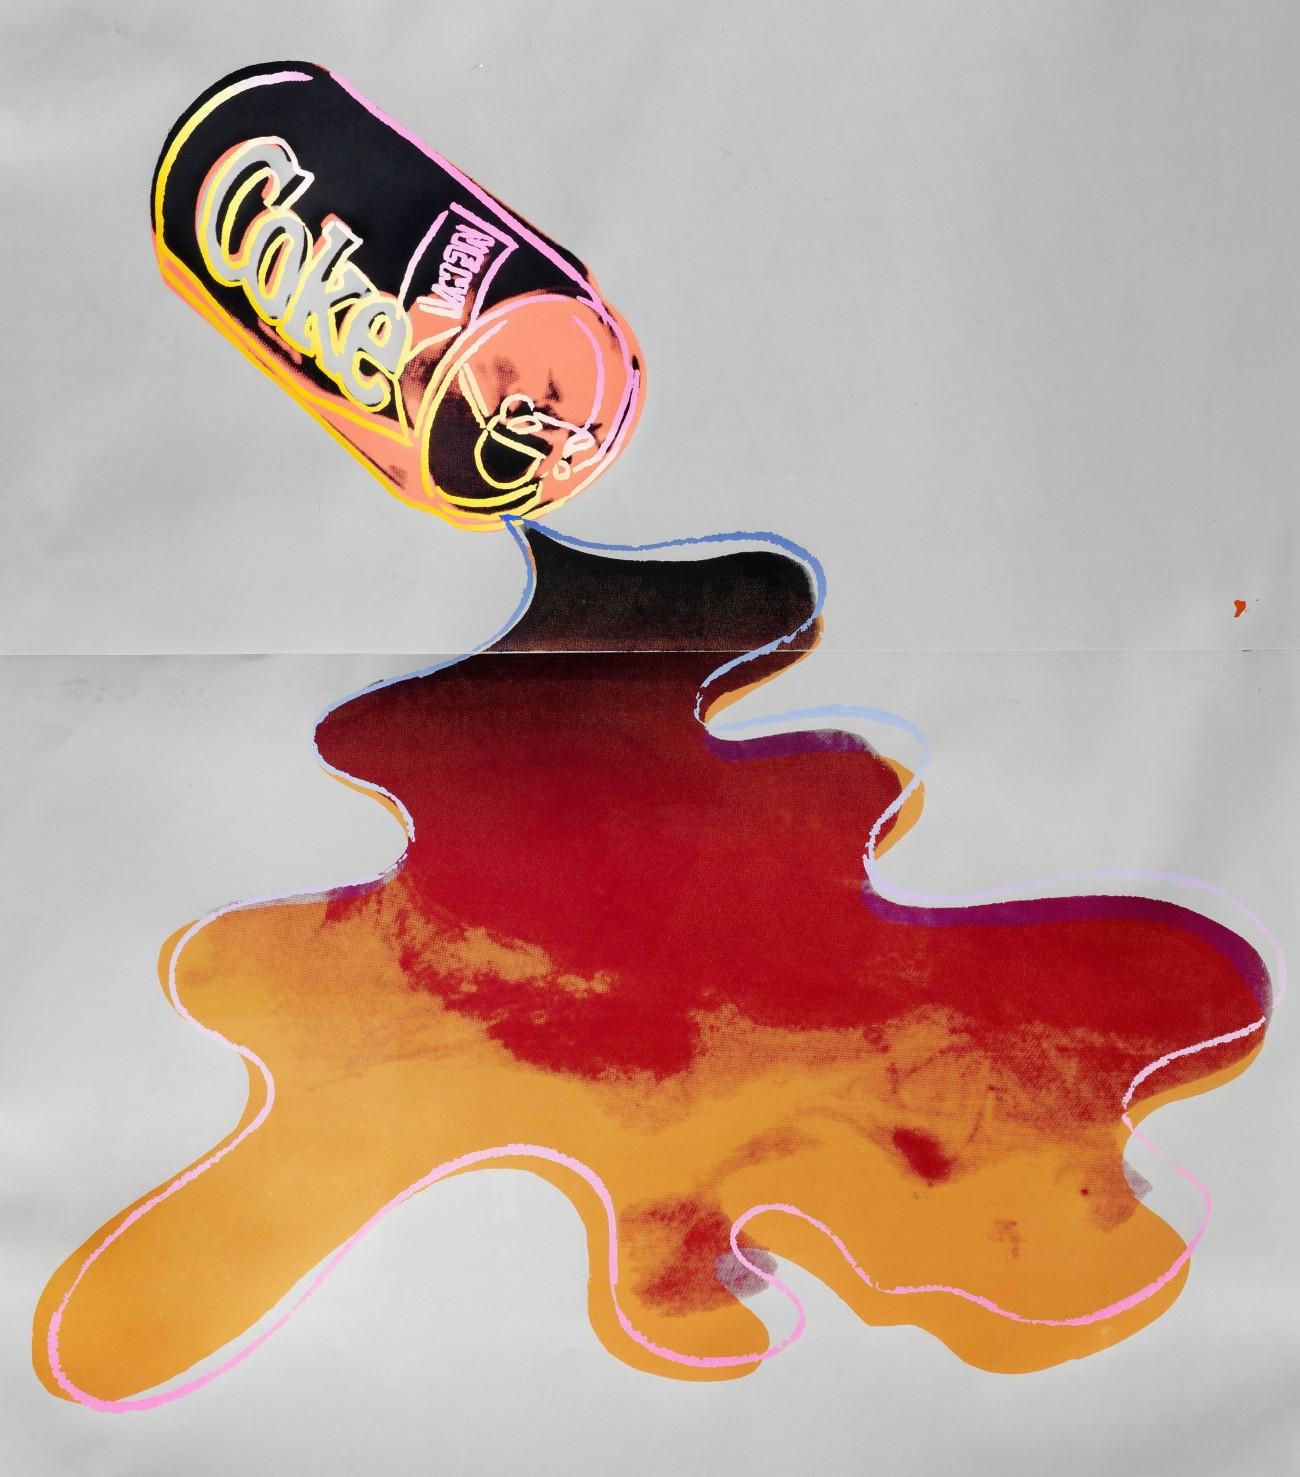 139 Andy Warhol (American, 1928-1987) New Coke Screenprint in colours £15,000-20,000